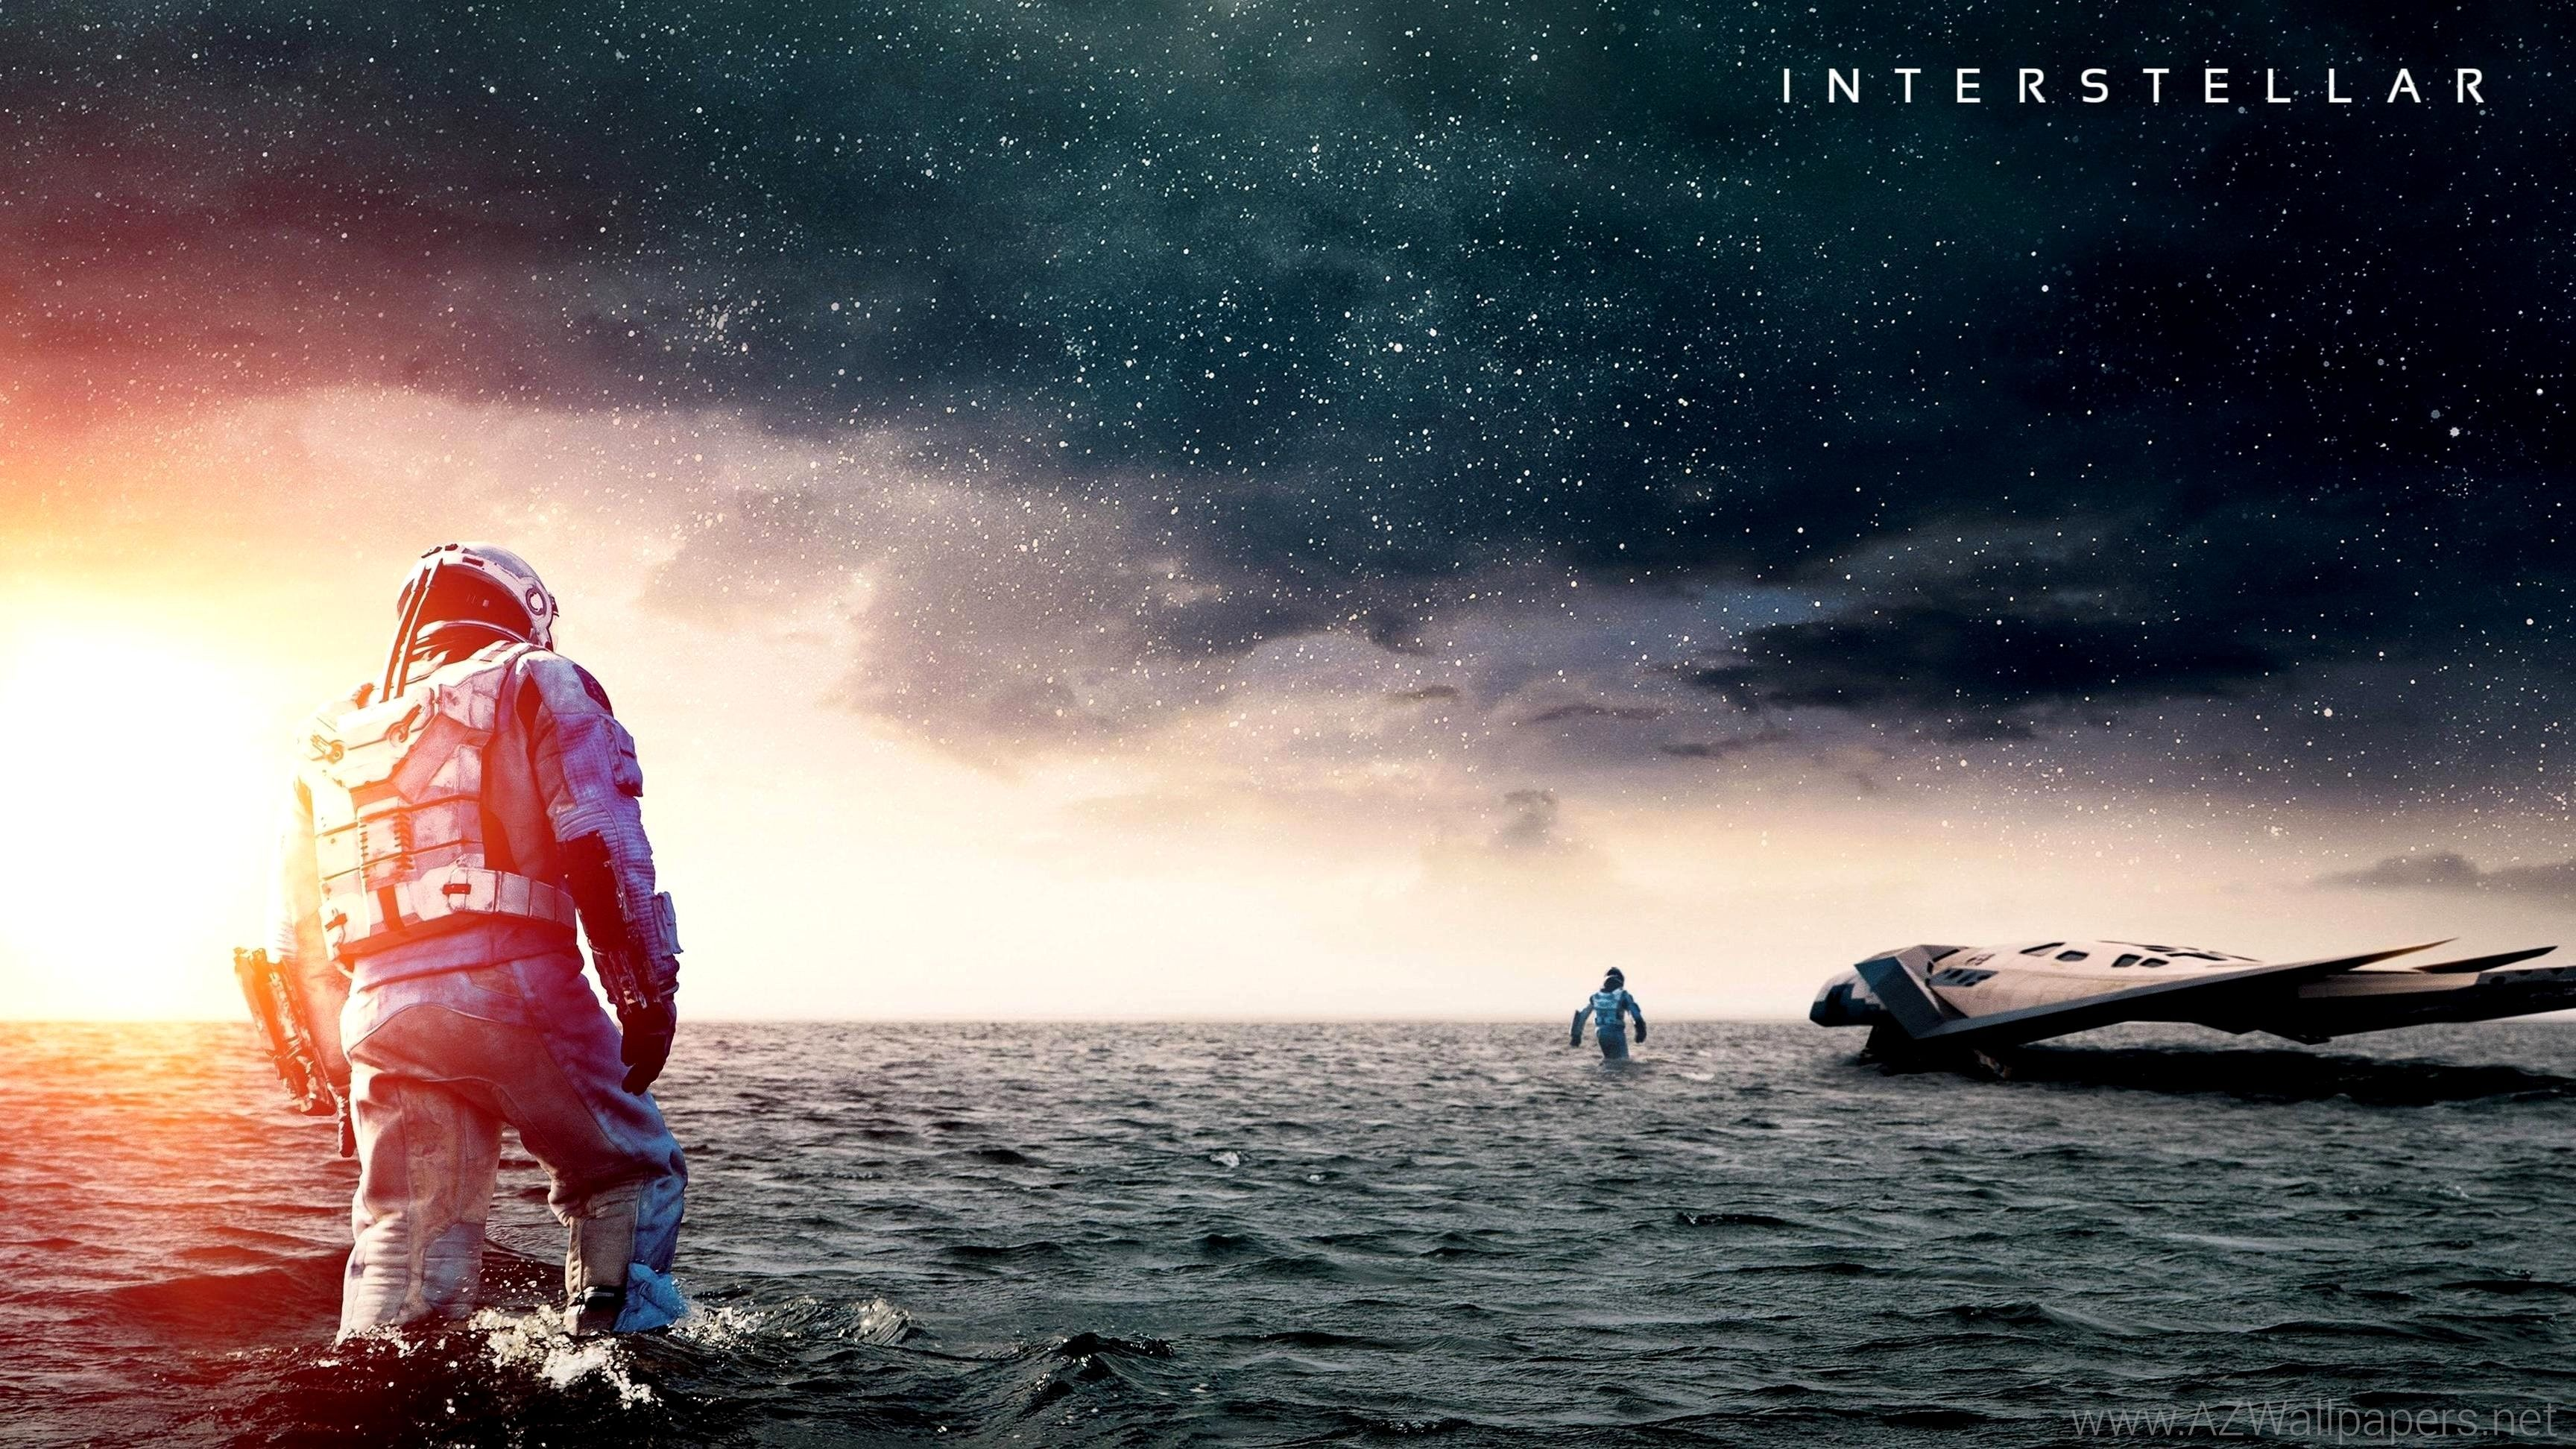 Wallpaper 4k Pc Windows 10 Ideas In 2020 Interstellar Film Interstellar Movie Poster Interstellar Movie